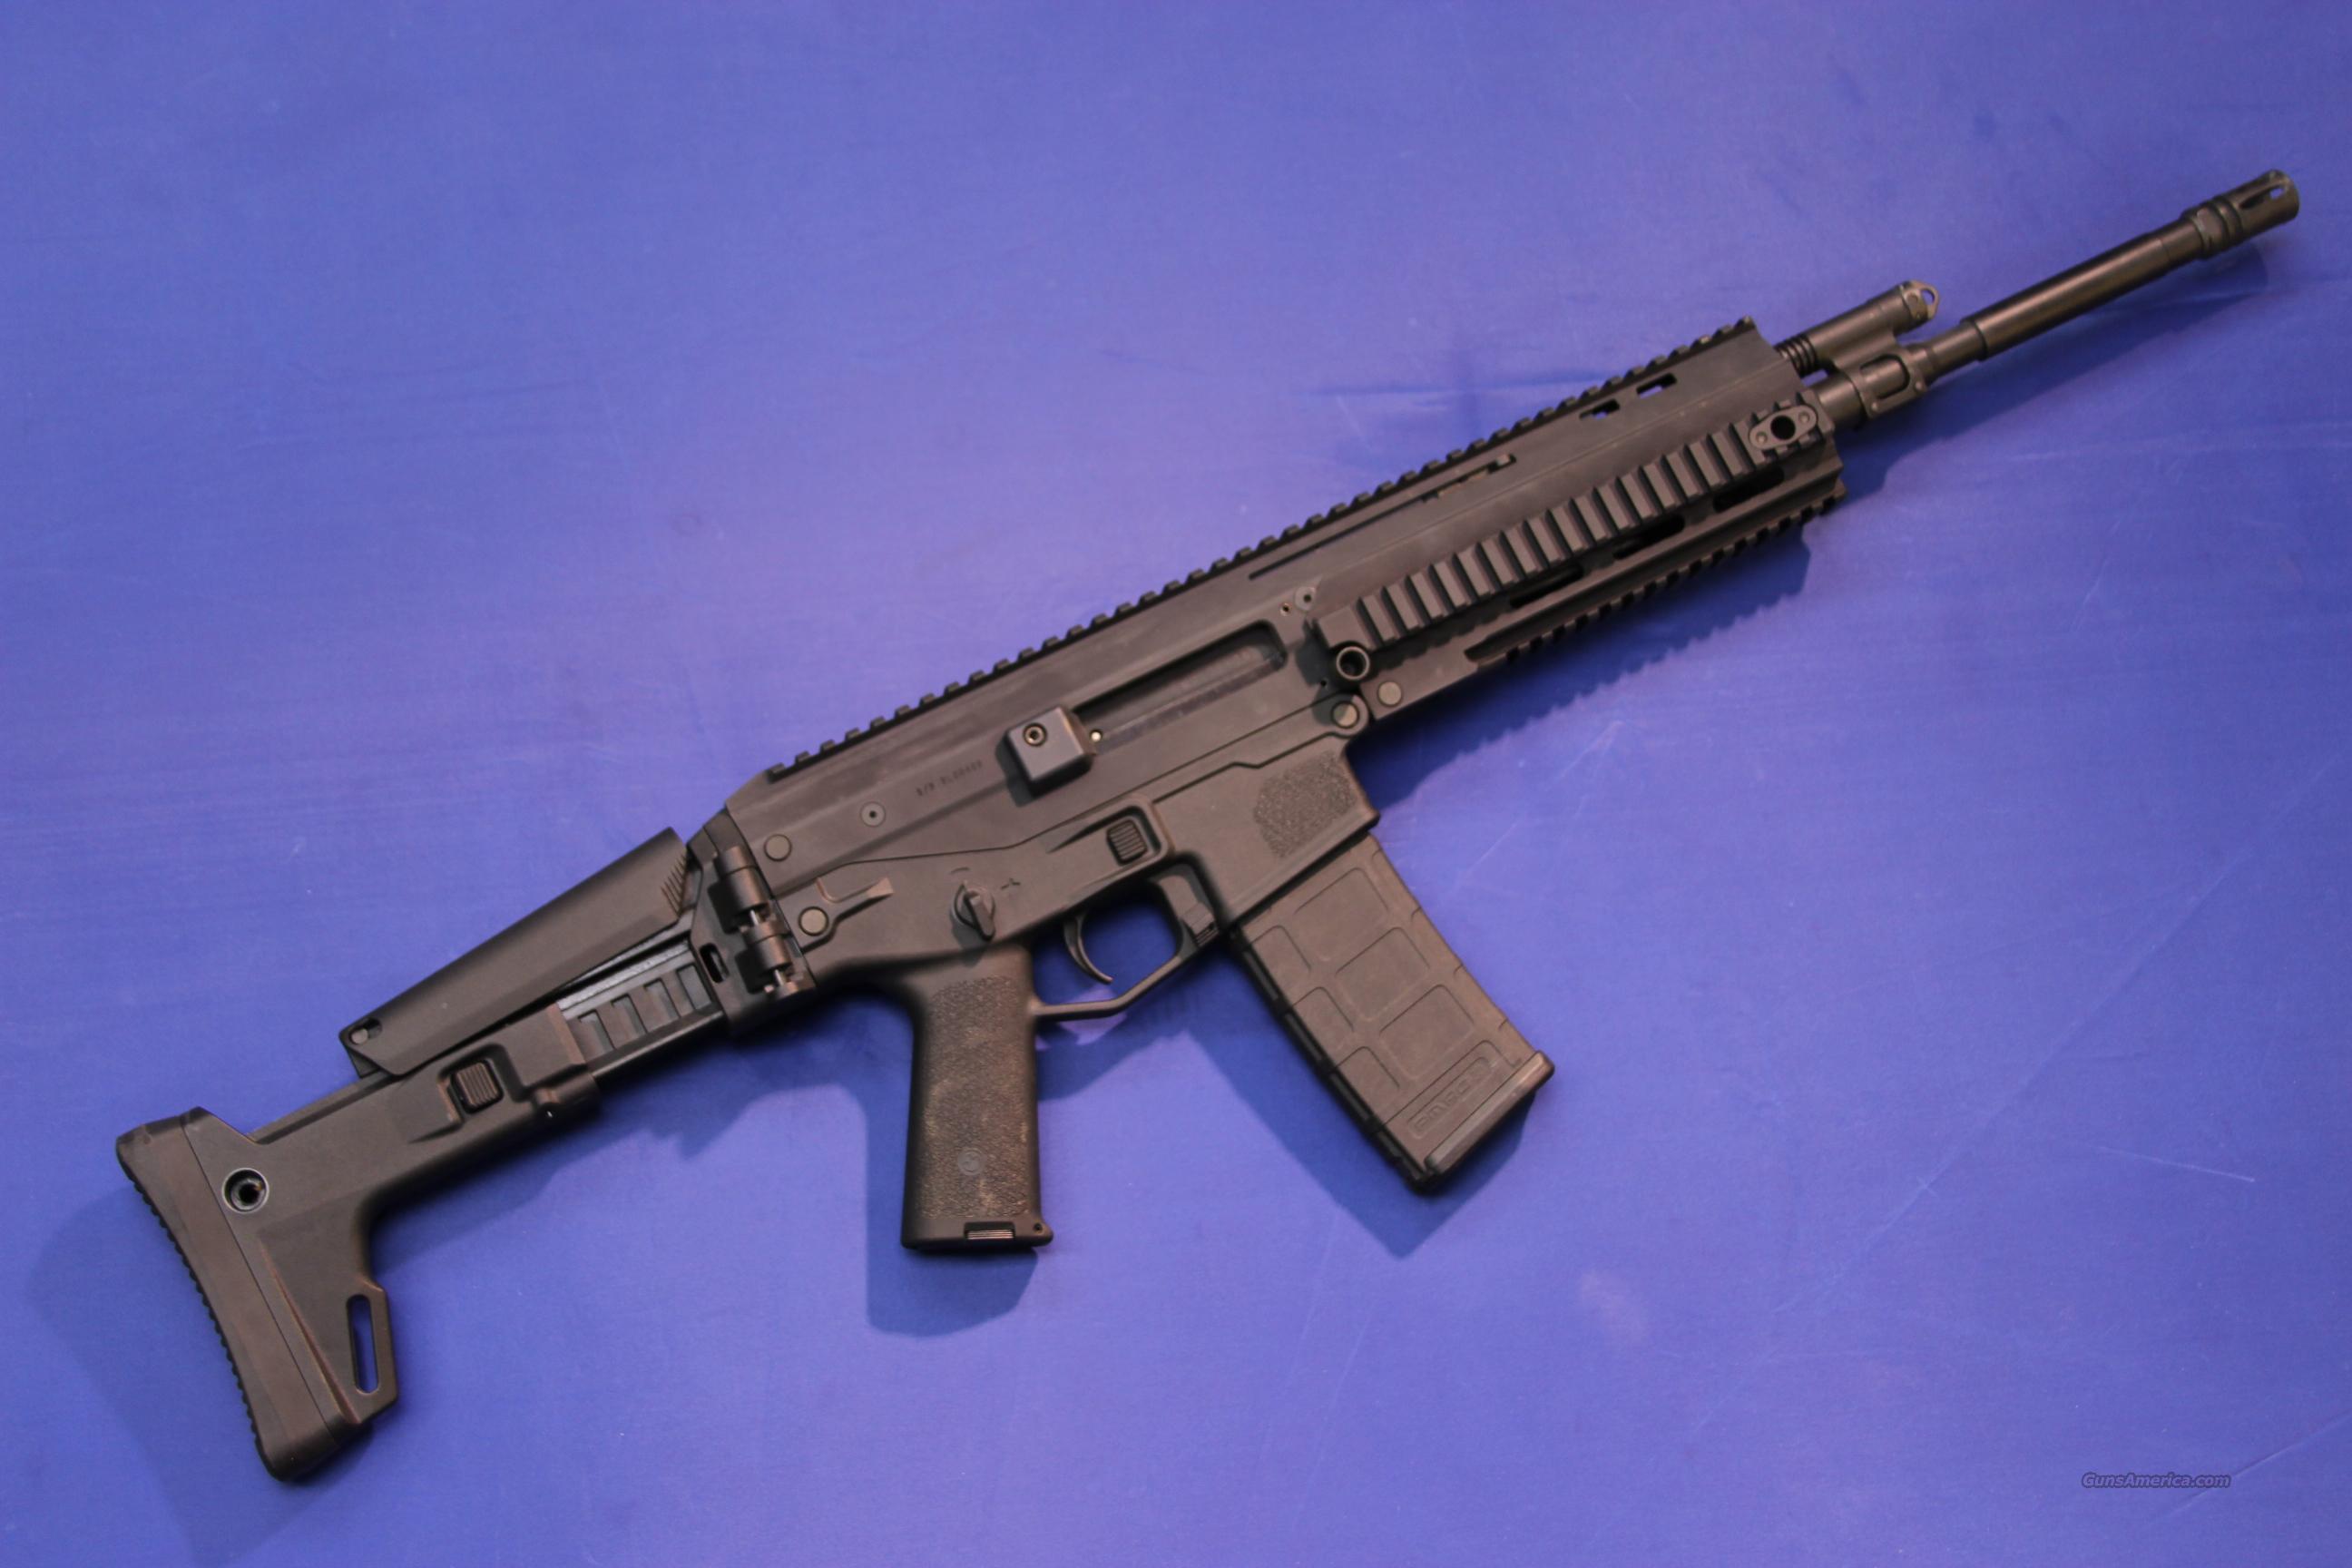 BUSHMASTER ACR ENHANCED CARBINE 5.56 NATO For Sale